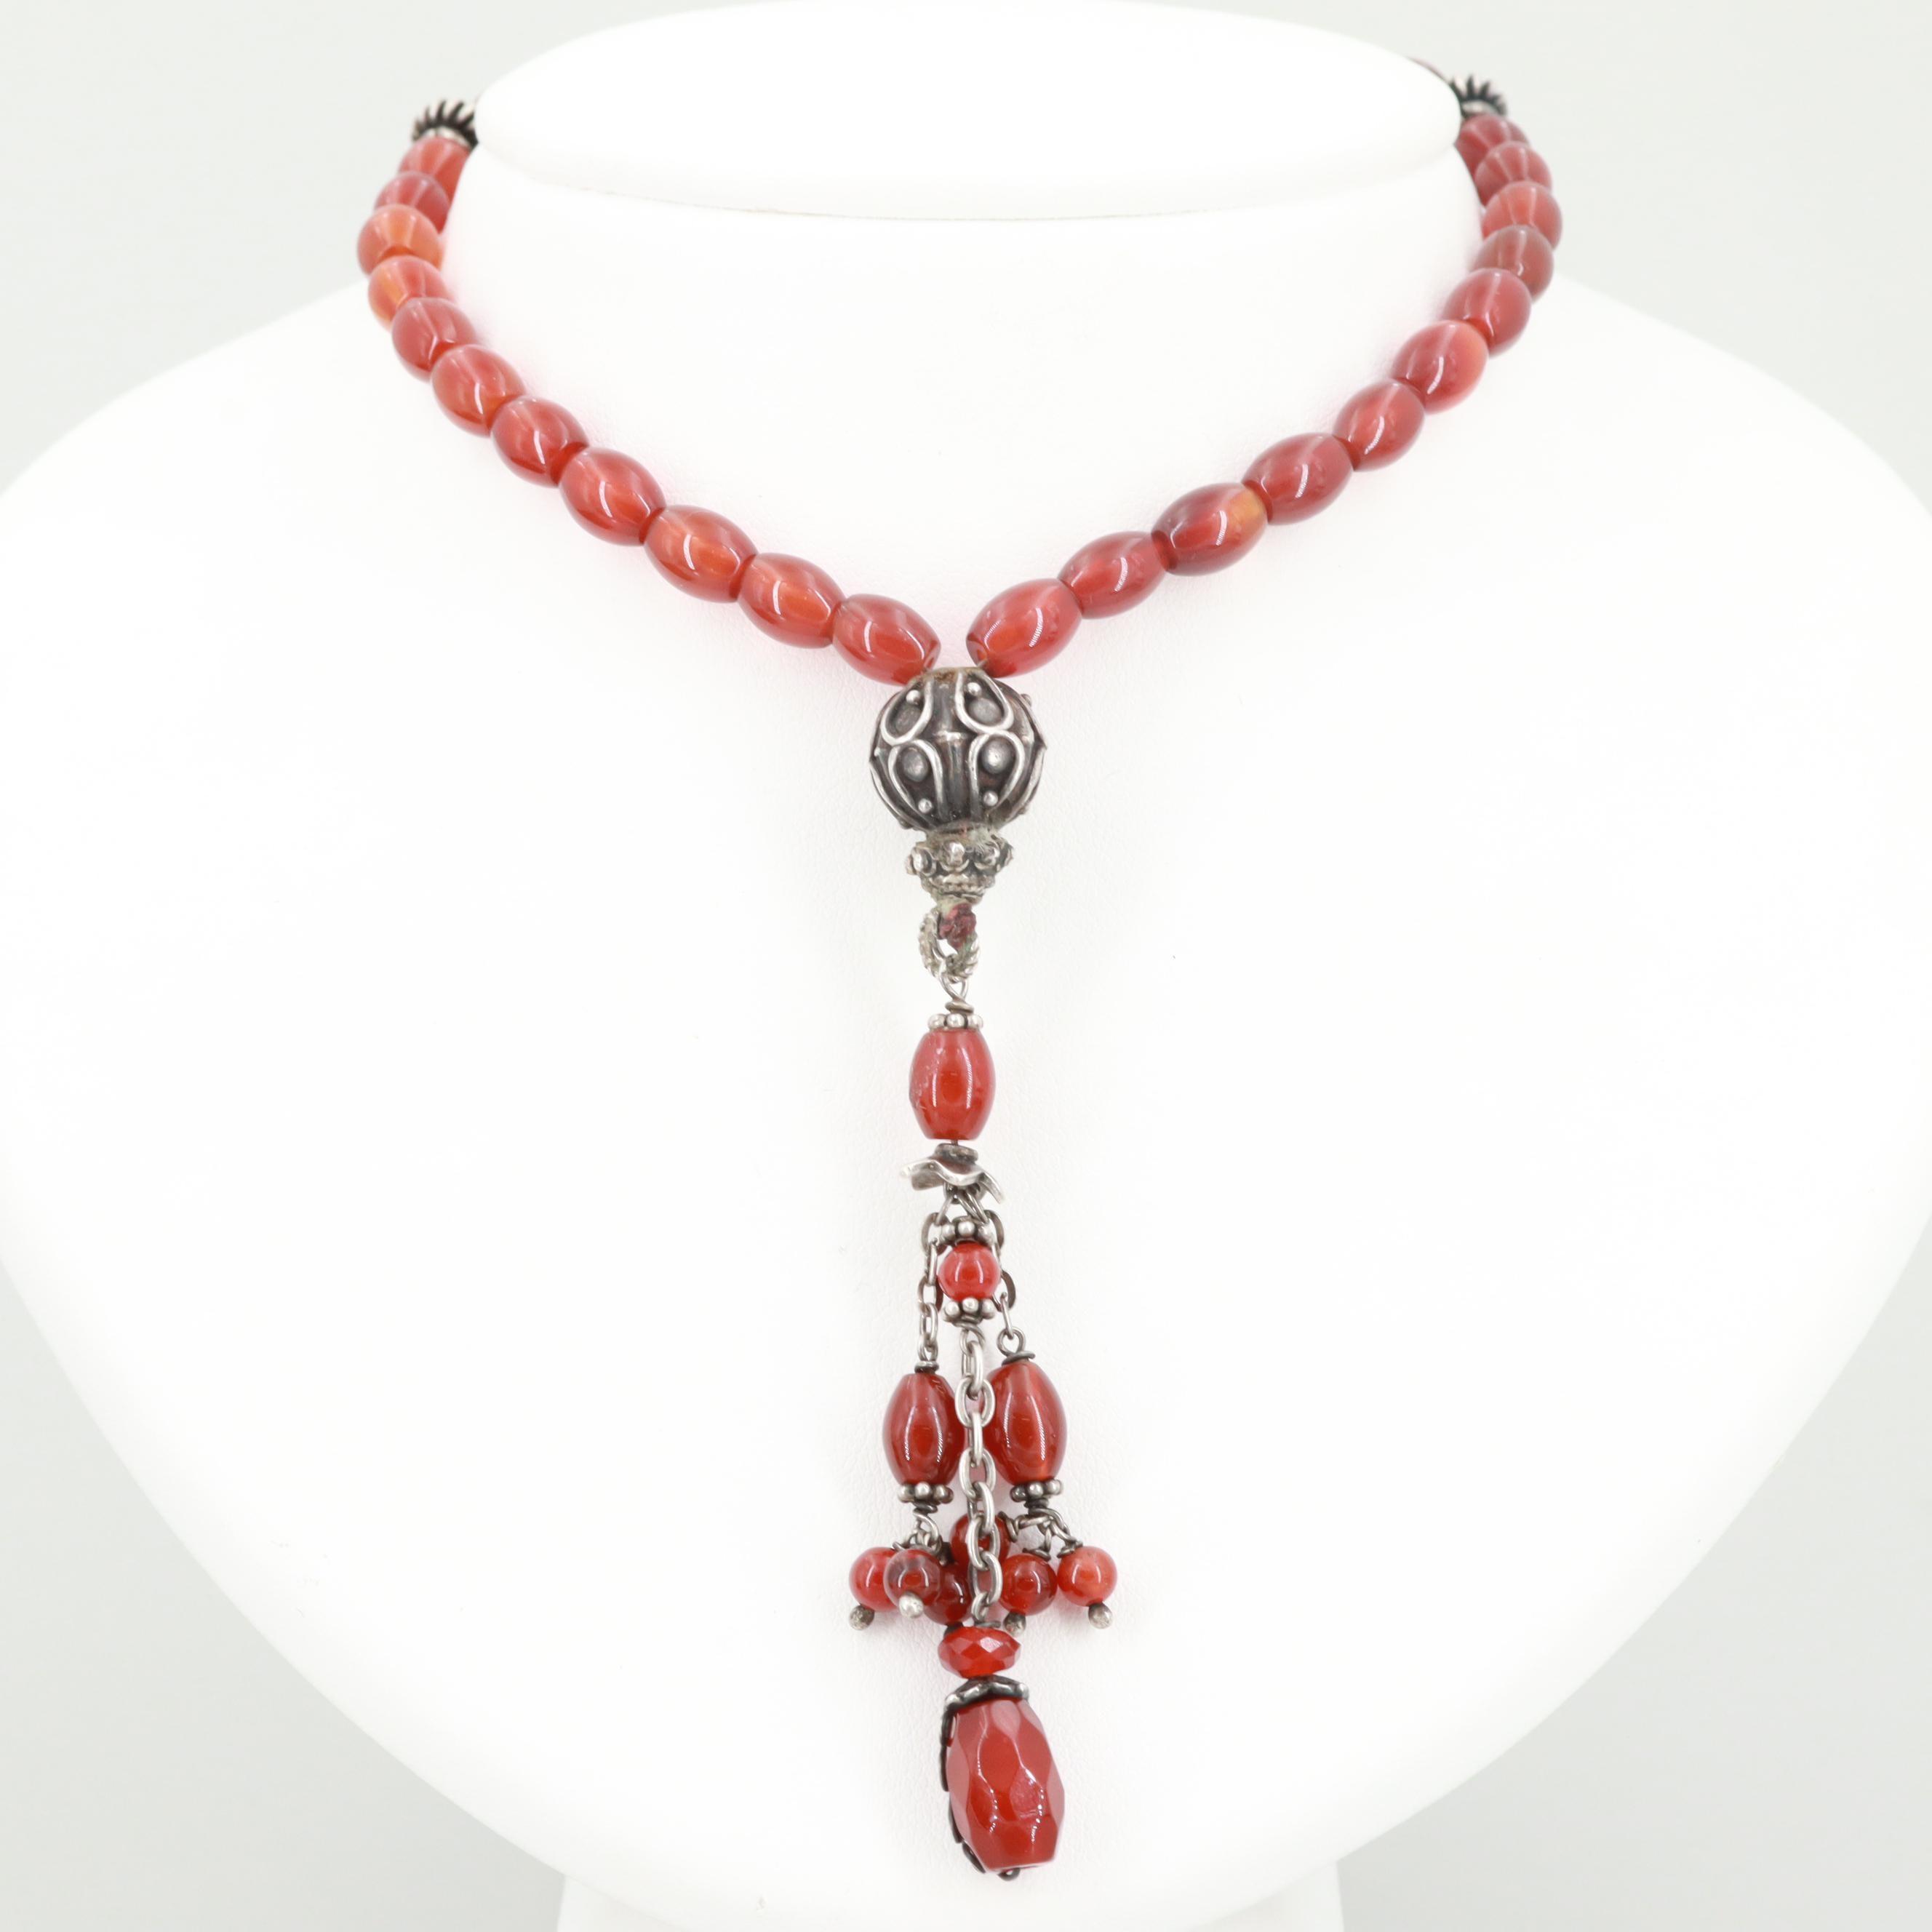 800 Silver and Silver Tone Carnelian Prayer Beads